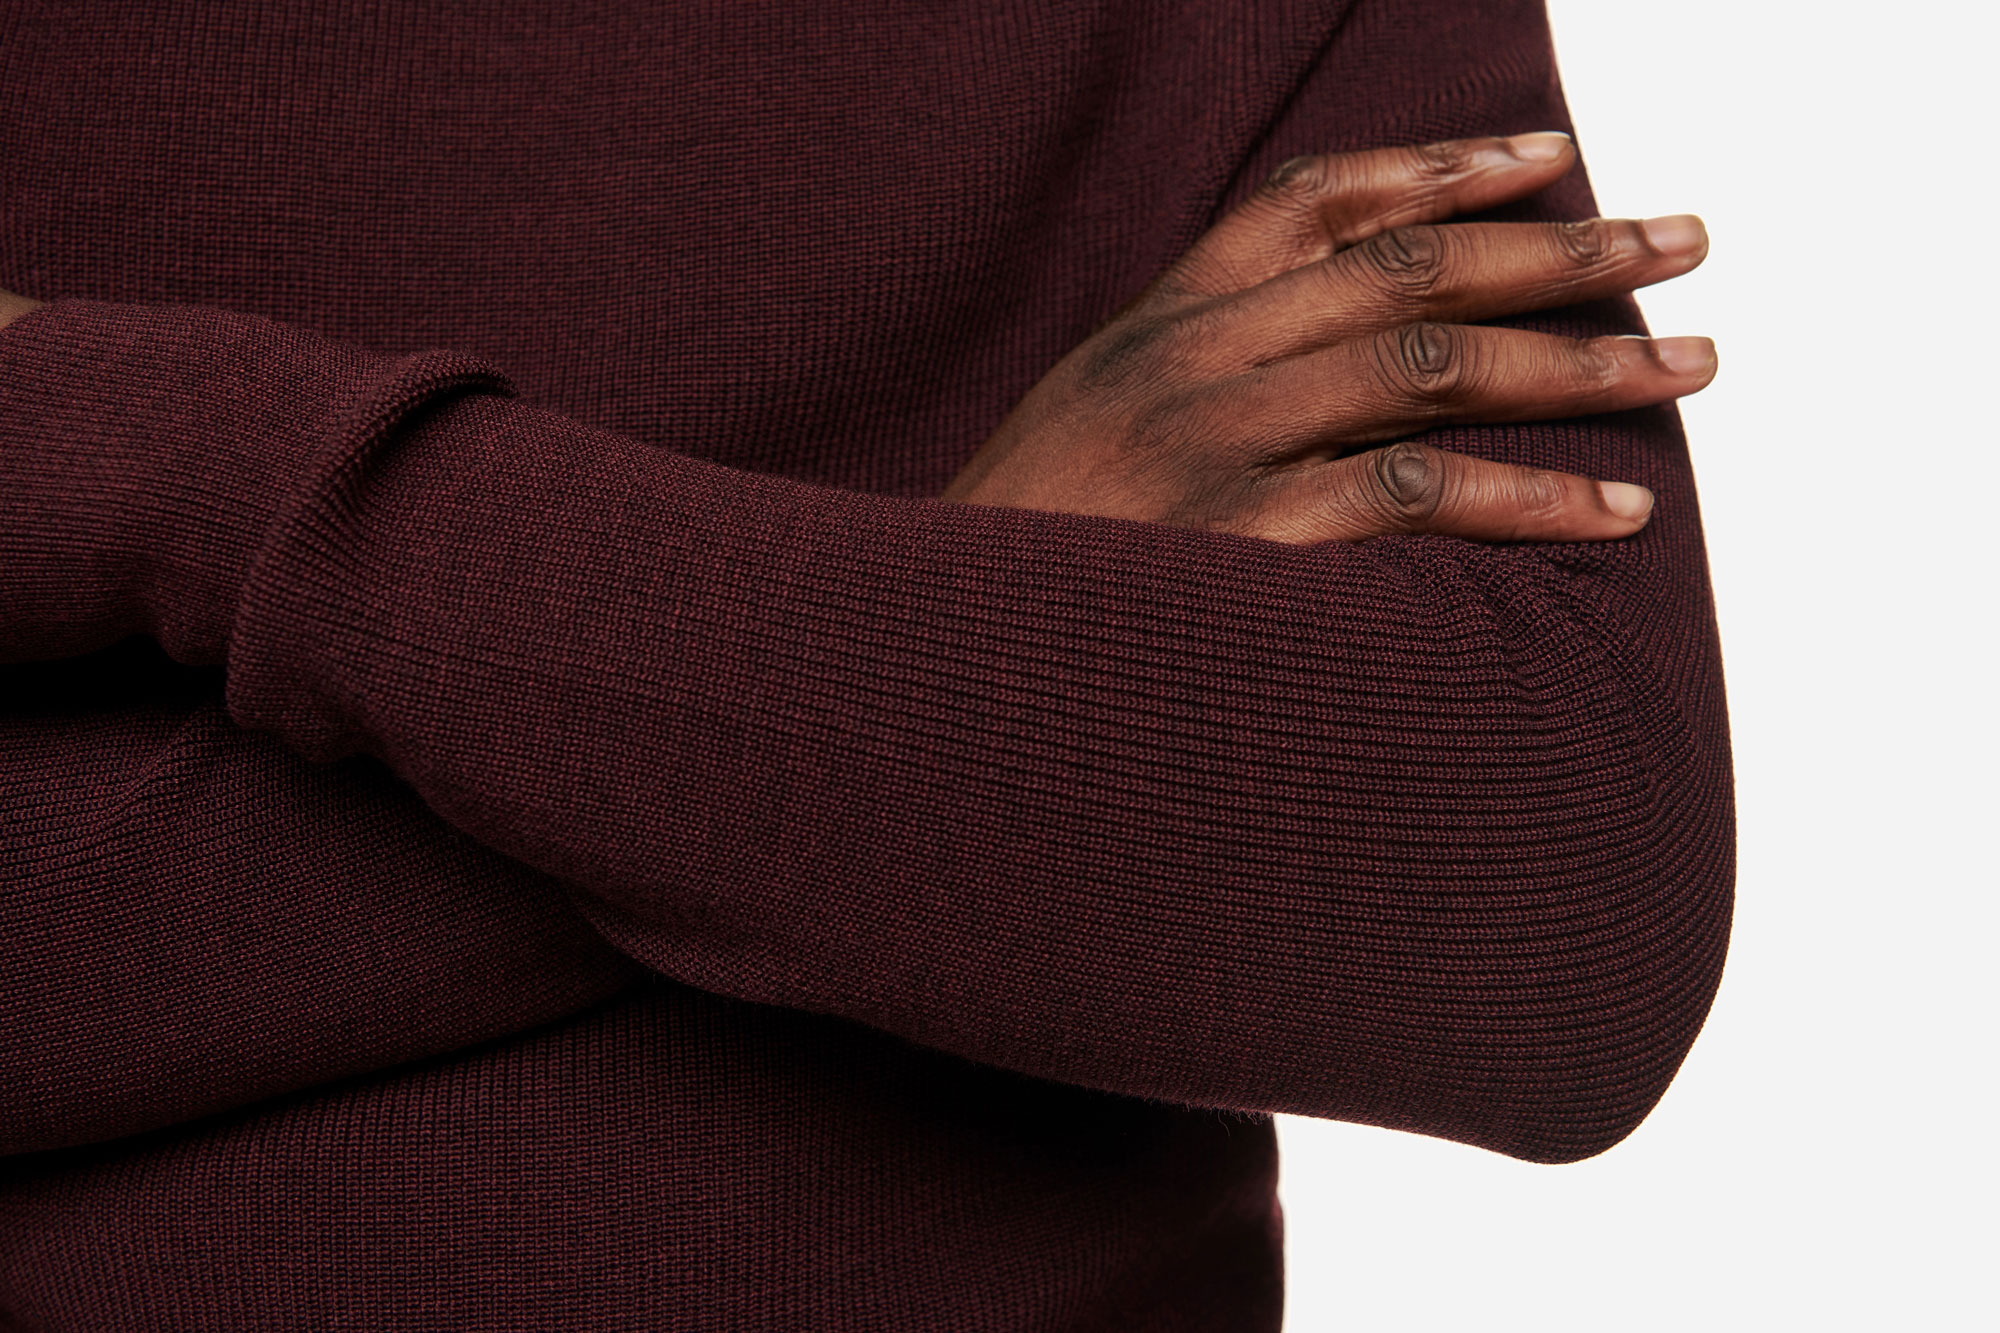 Teym - Turtleneck - The Merino Sweater - Men - Burgundy - 4